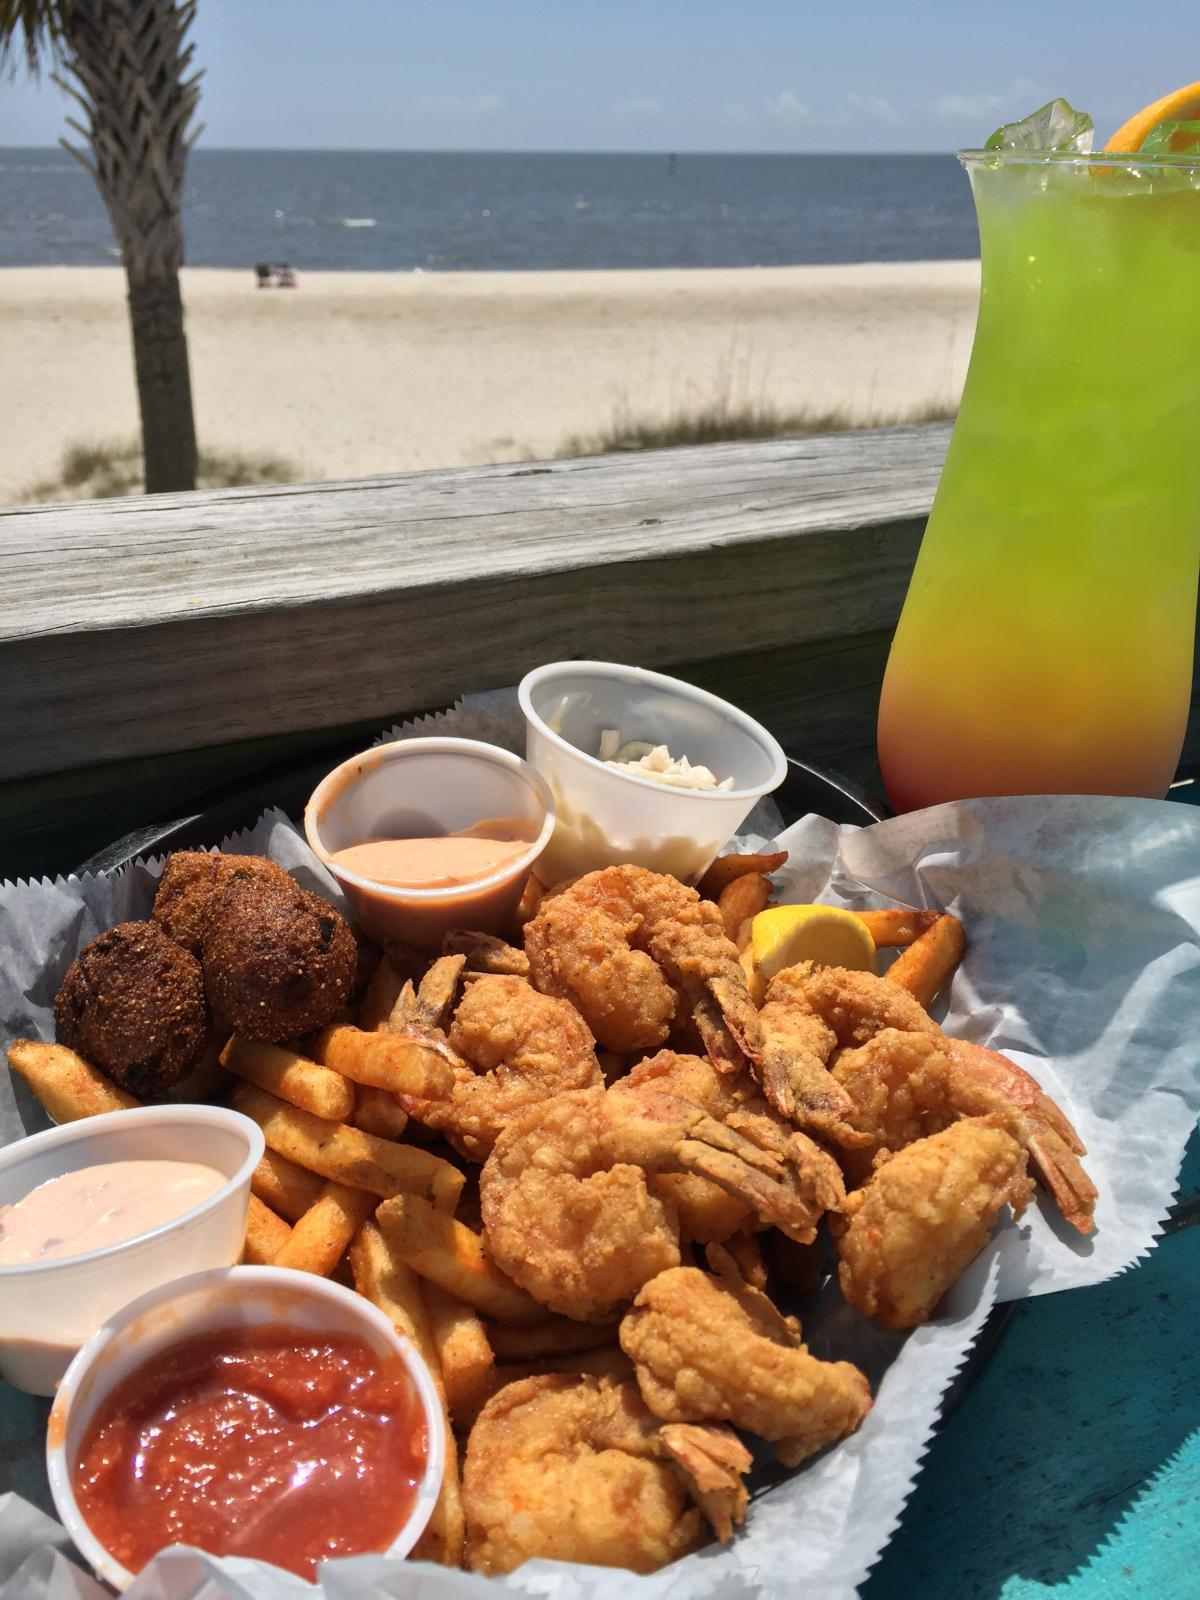 Shaggy S Biloxi Beach Biloxi Ms 39531